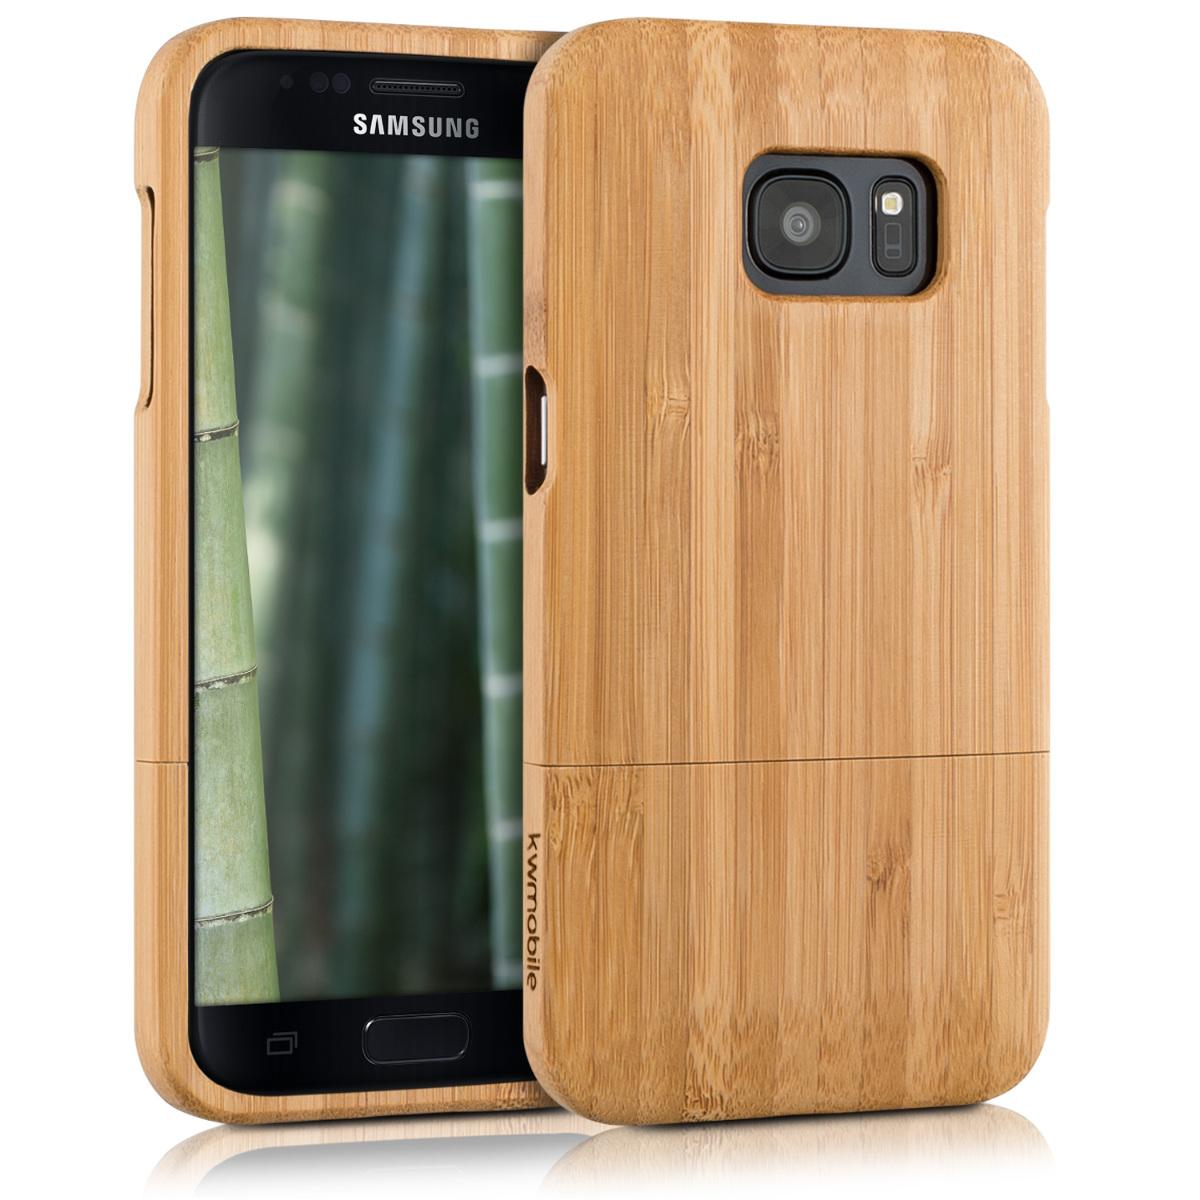 KW Σκληρή Ξύλινη Θήκη - Samsung Galaxy S7 (37139.24)